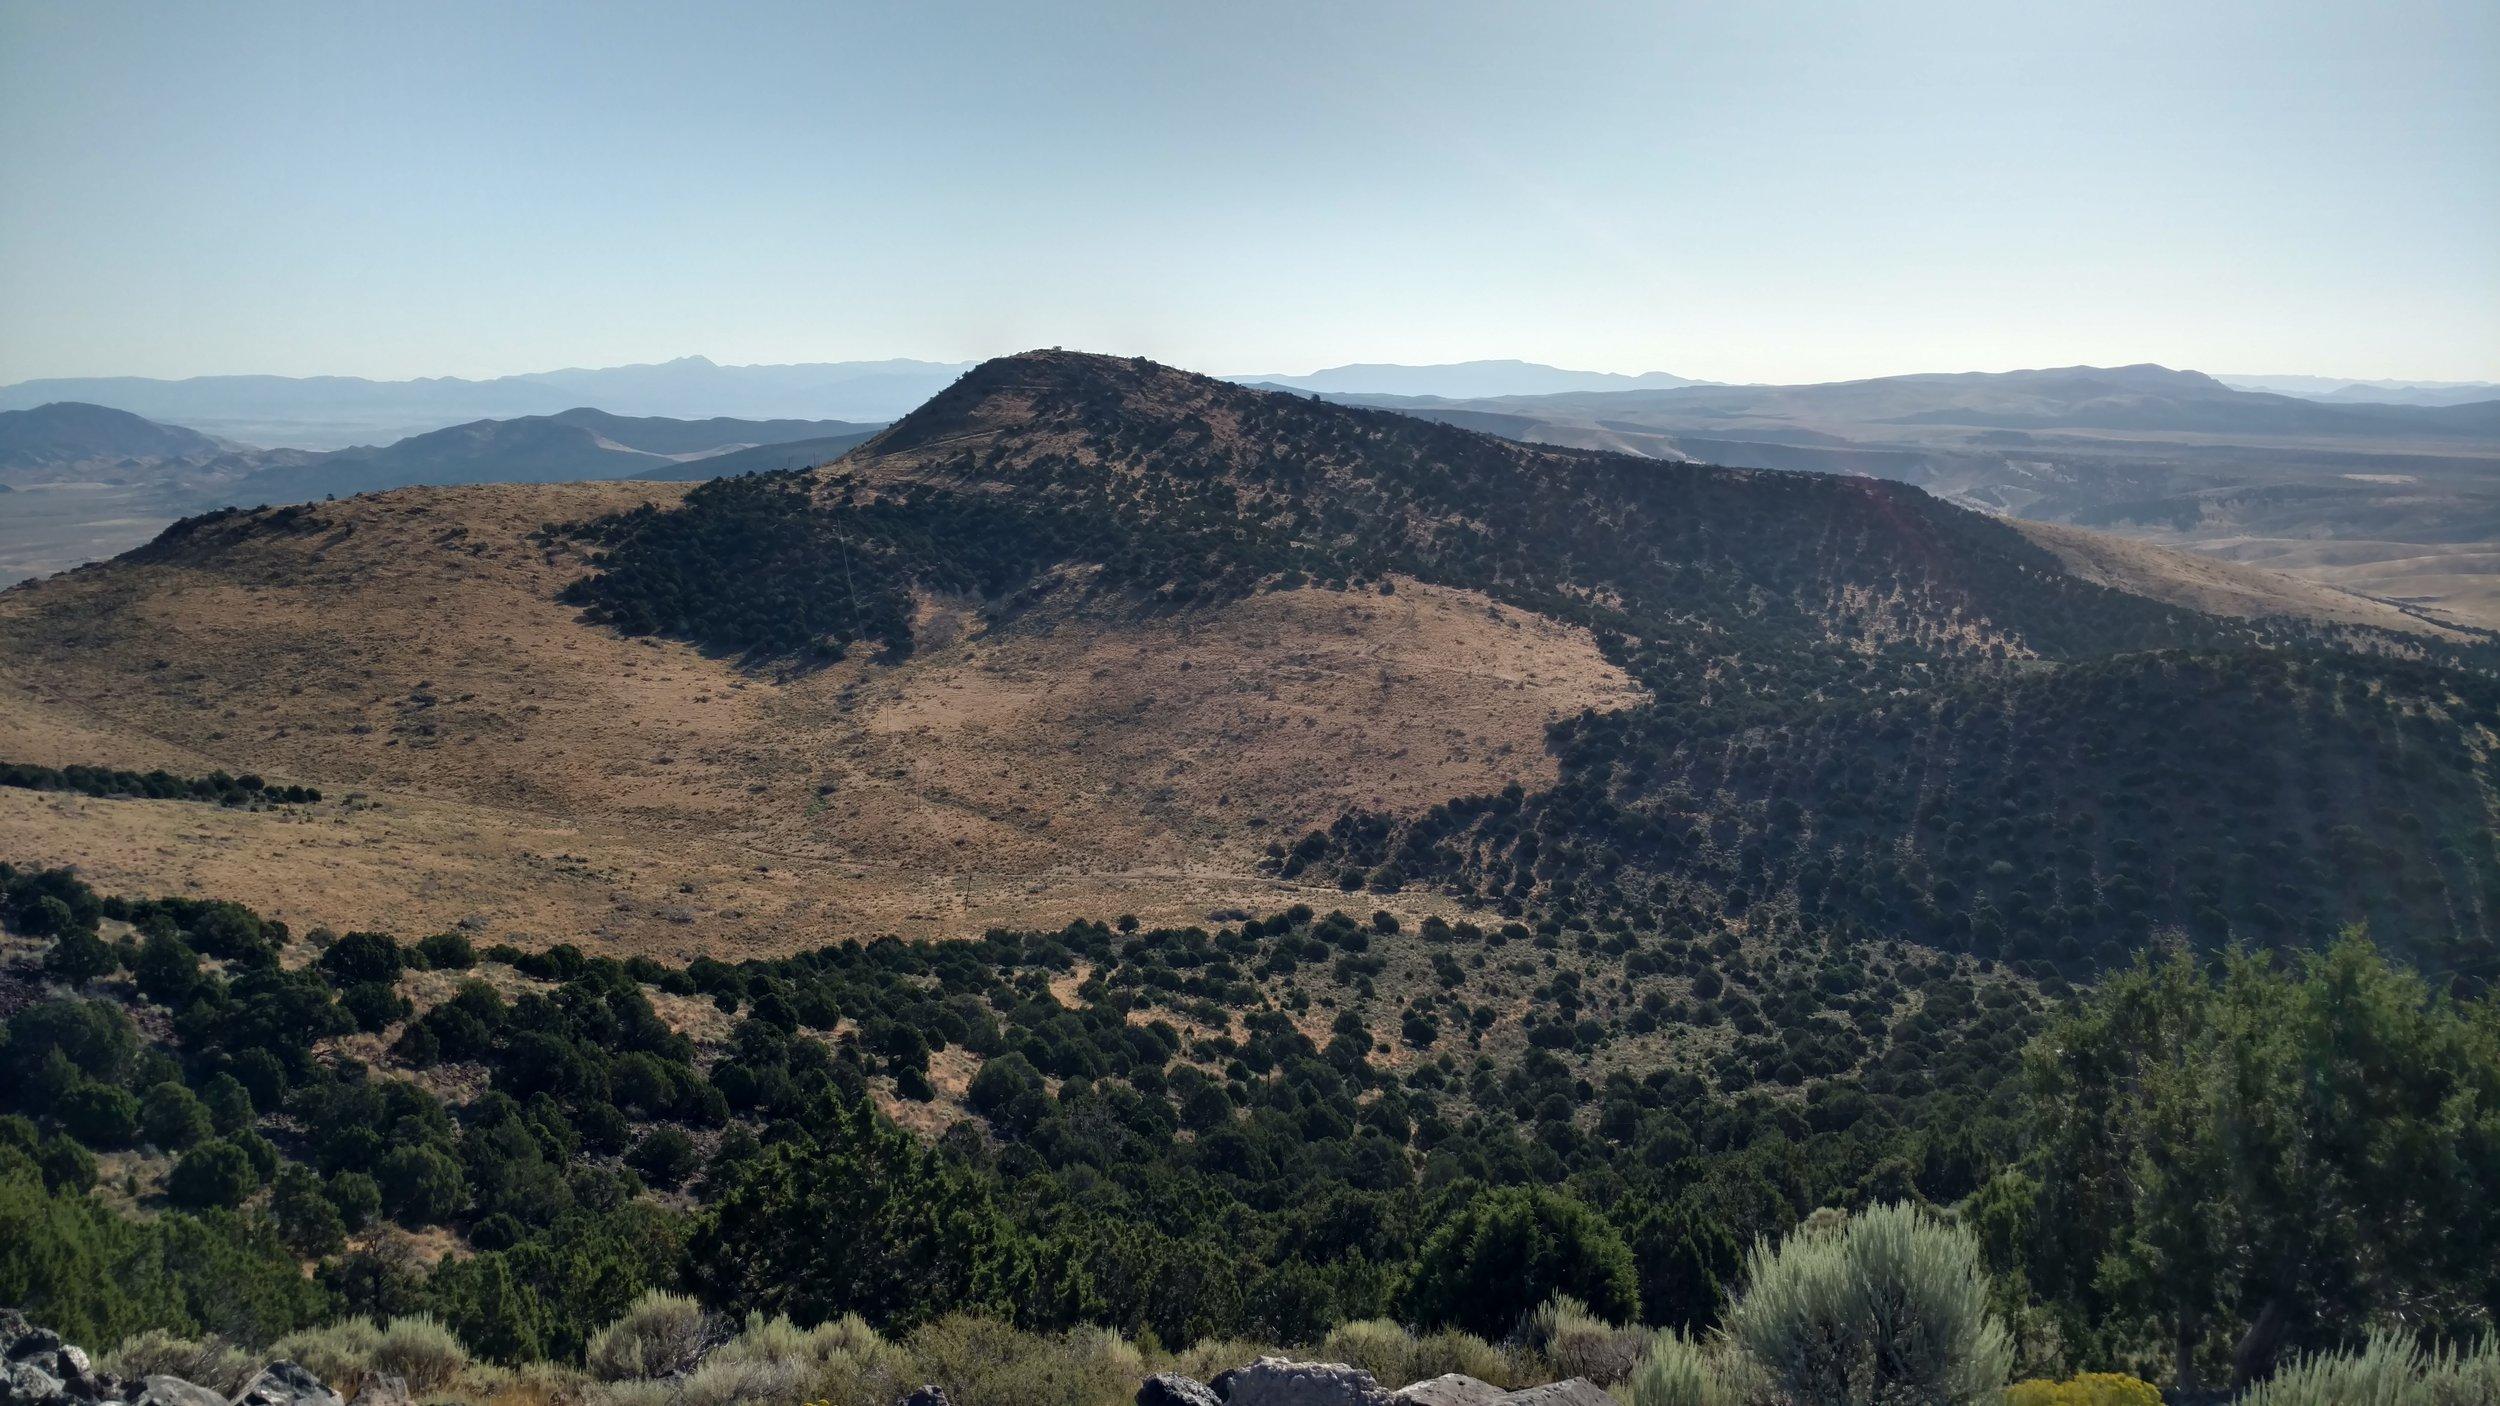 Dry Willow Peak; Iron County: Dry Willow Peak - UT quad; Rise 1,053'; UT Rank: 1,715